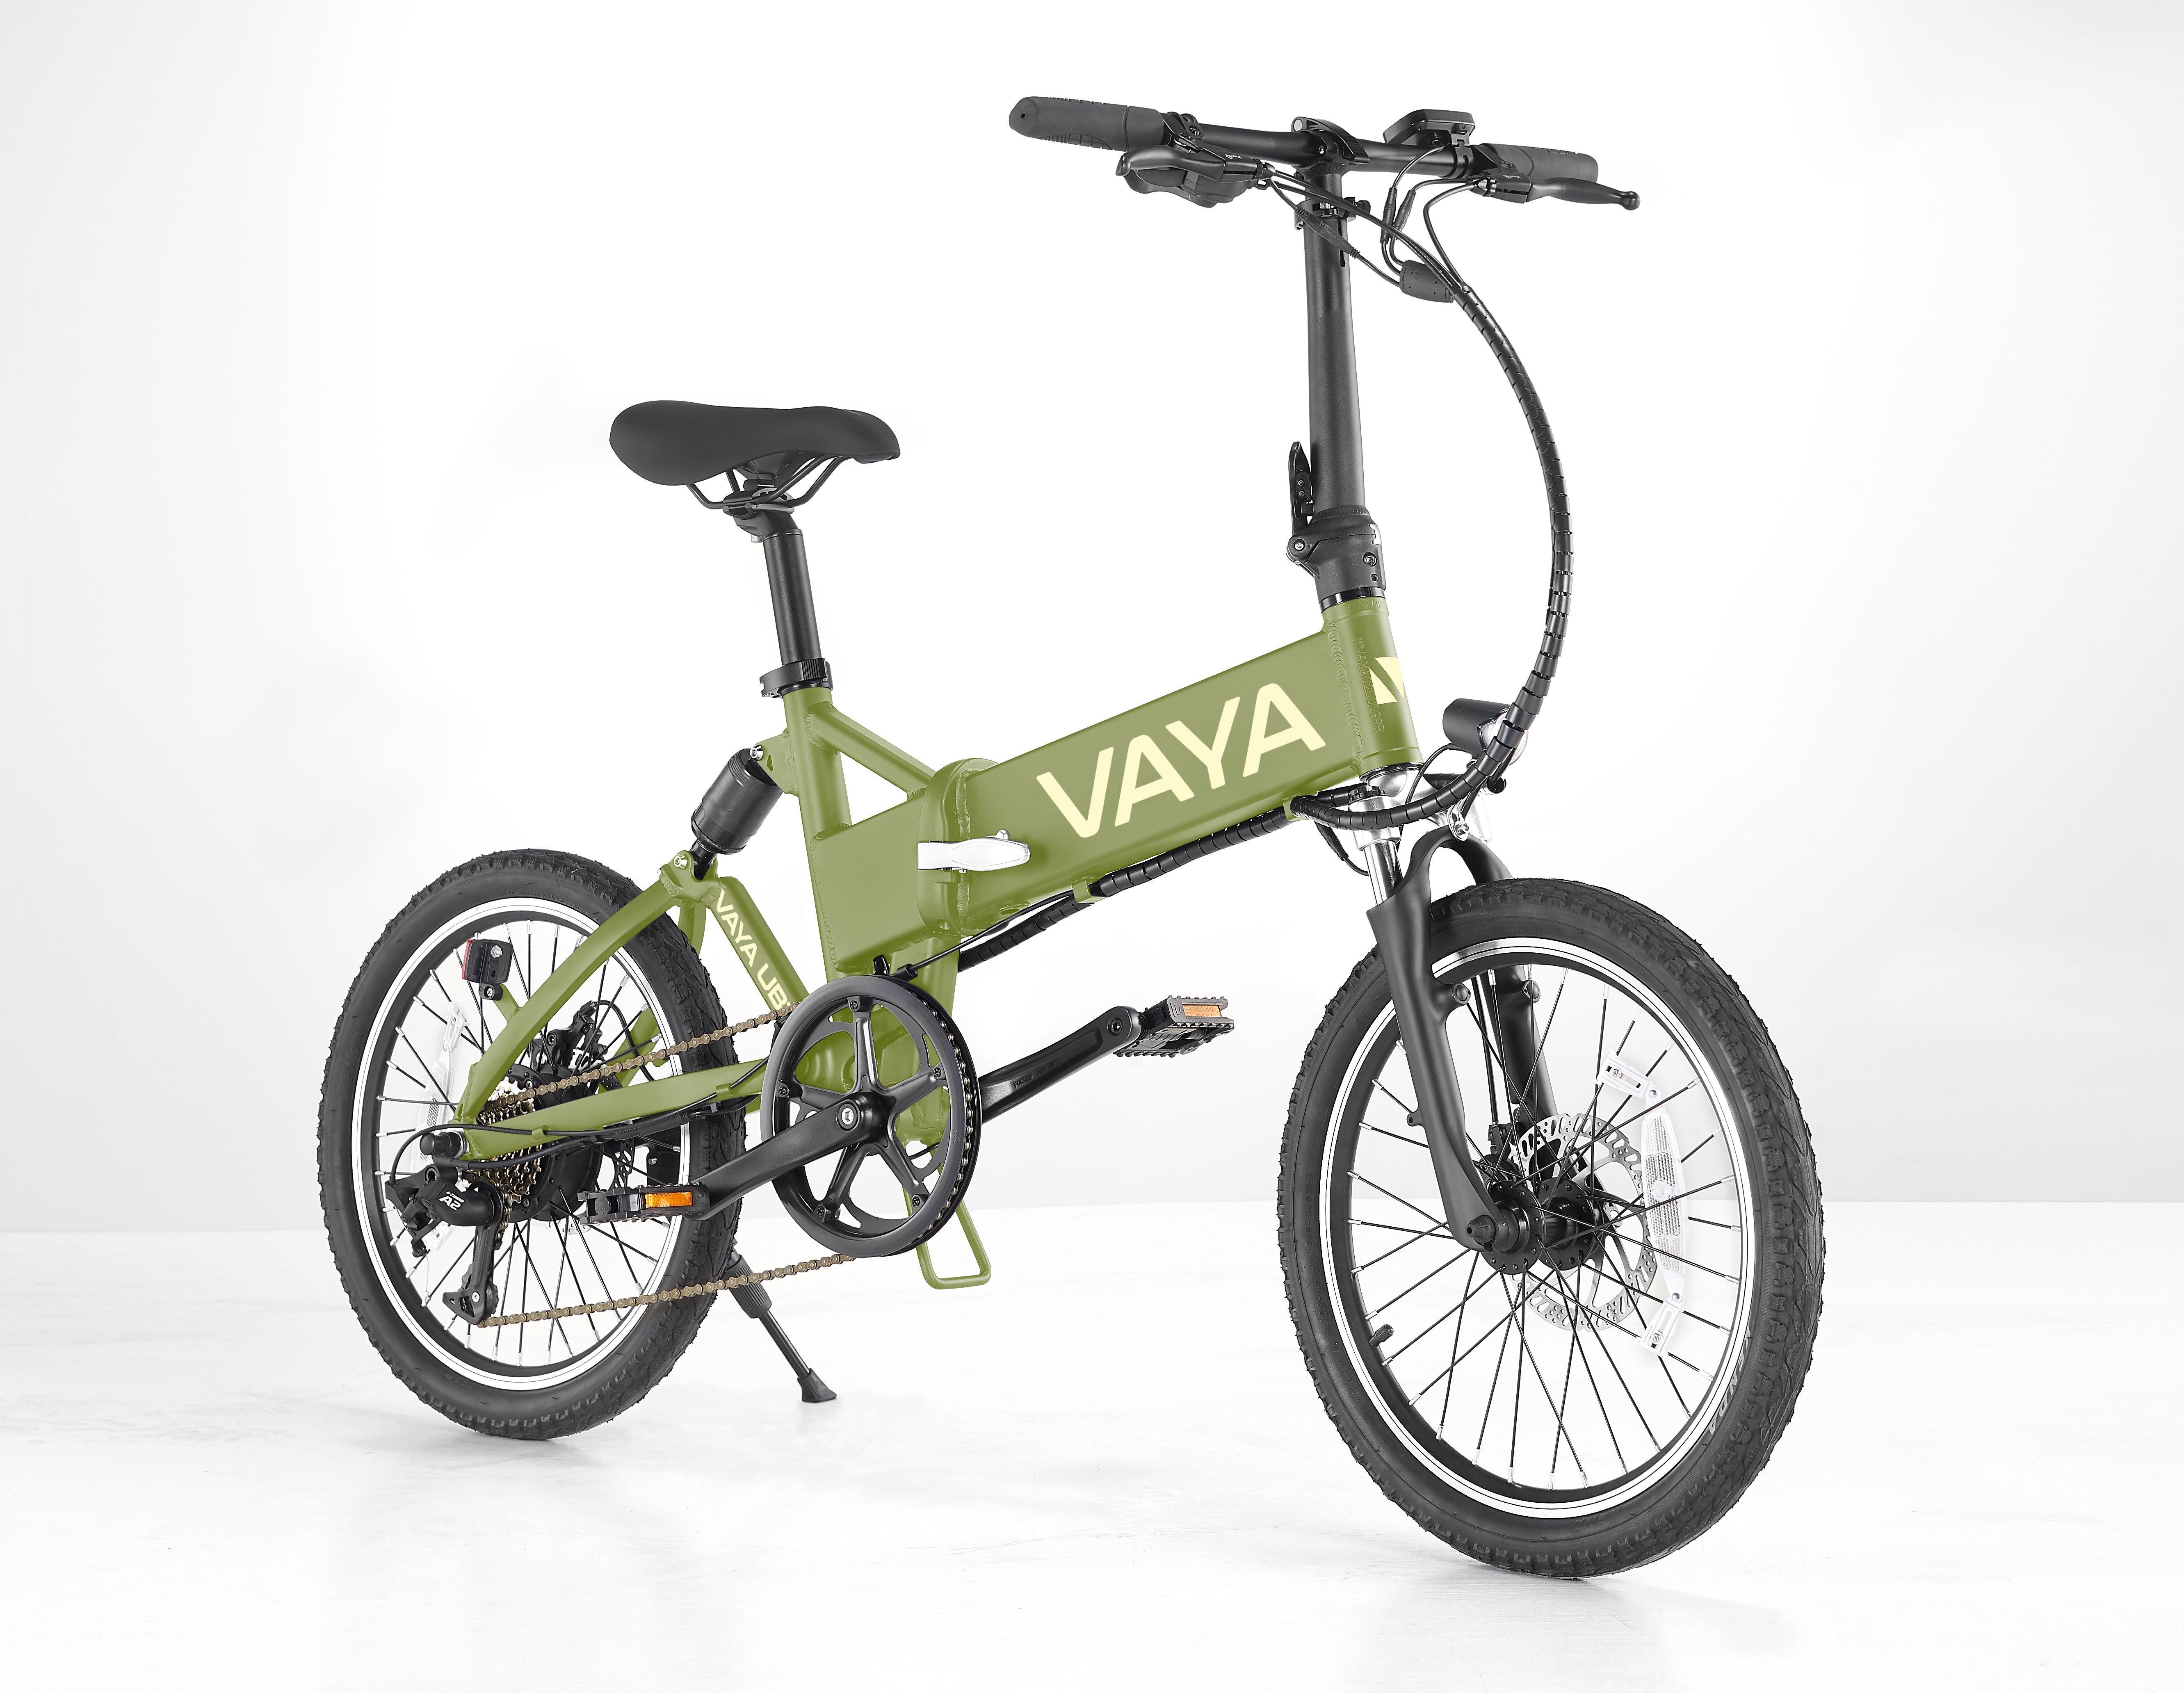 Vaya - Urban E-Bike UB-1 - Electric Bike - Army (1660UB1-AR)